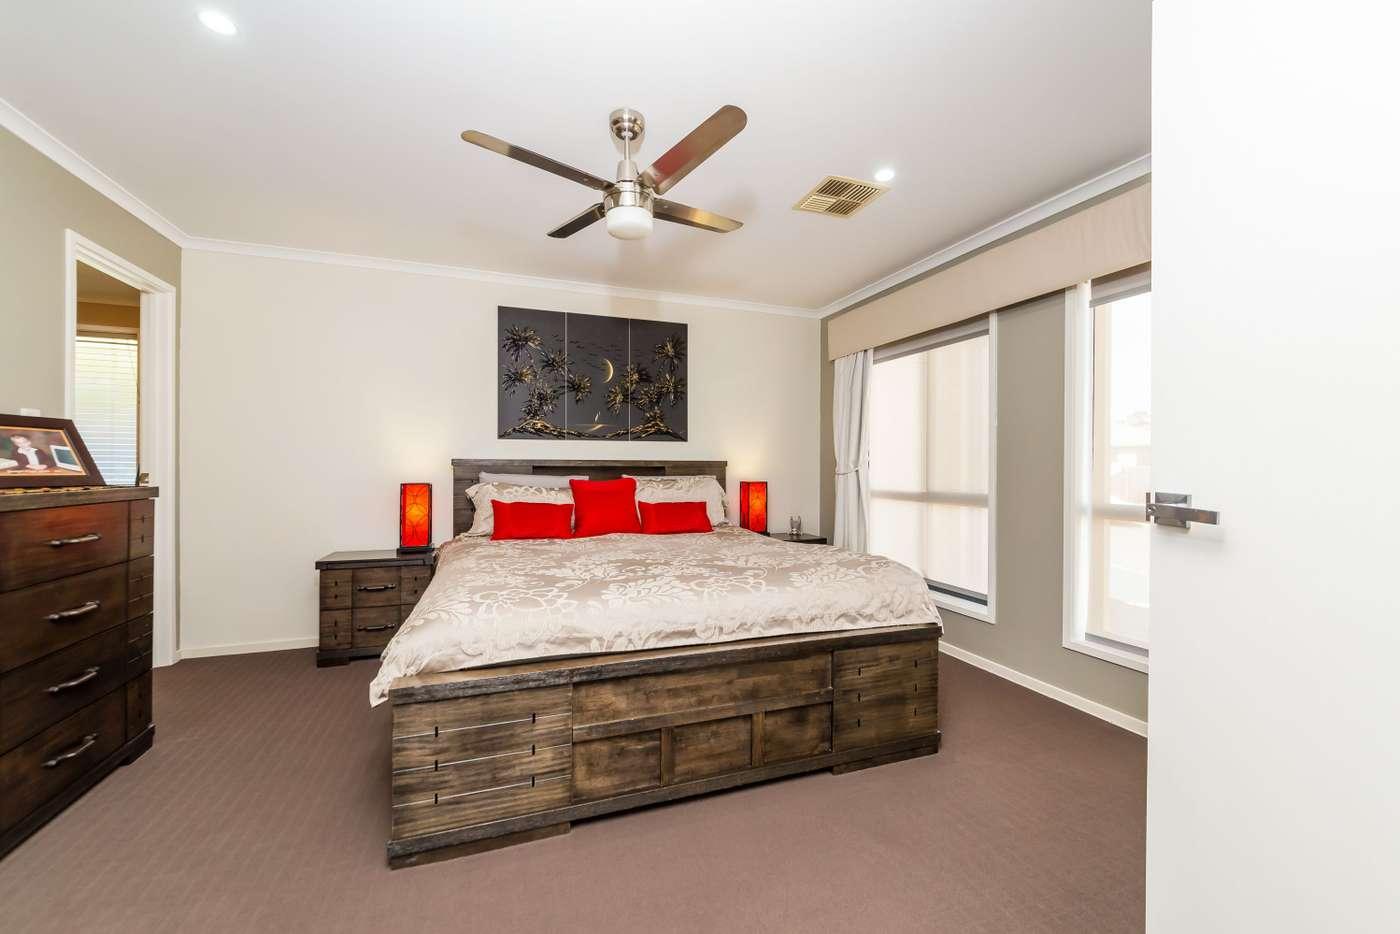 Sixth view of Homely house listing, 5 Thompson Circuit, Evanston Park SA 5116